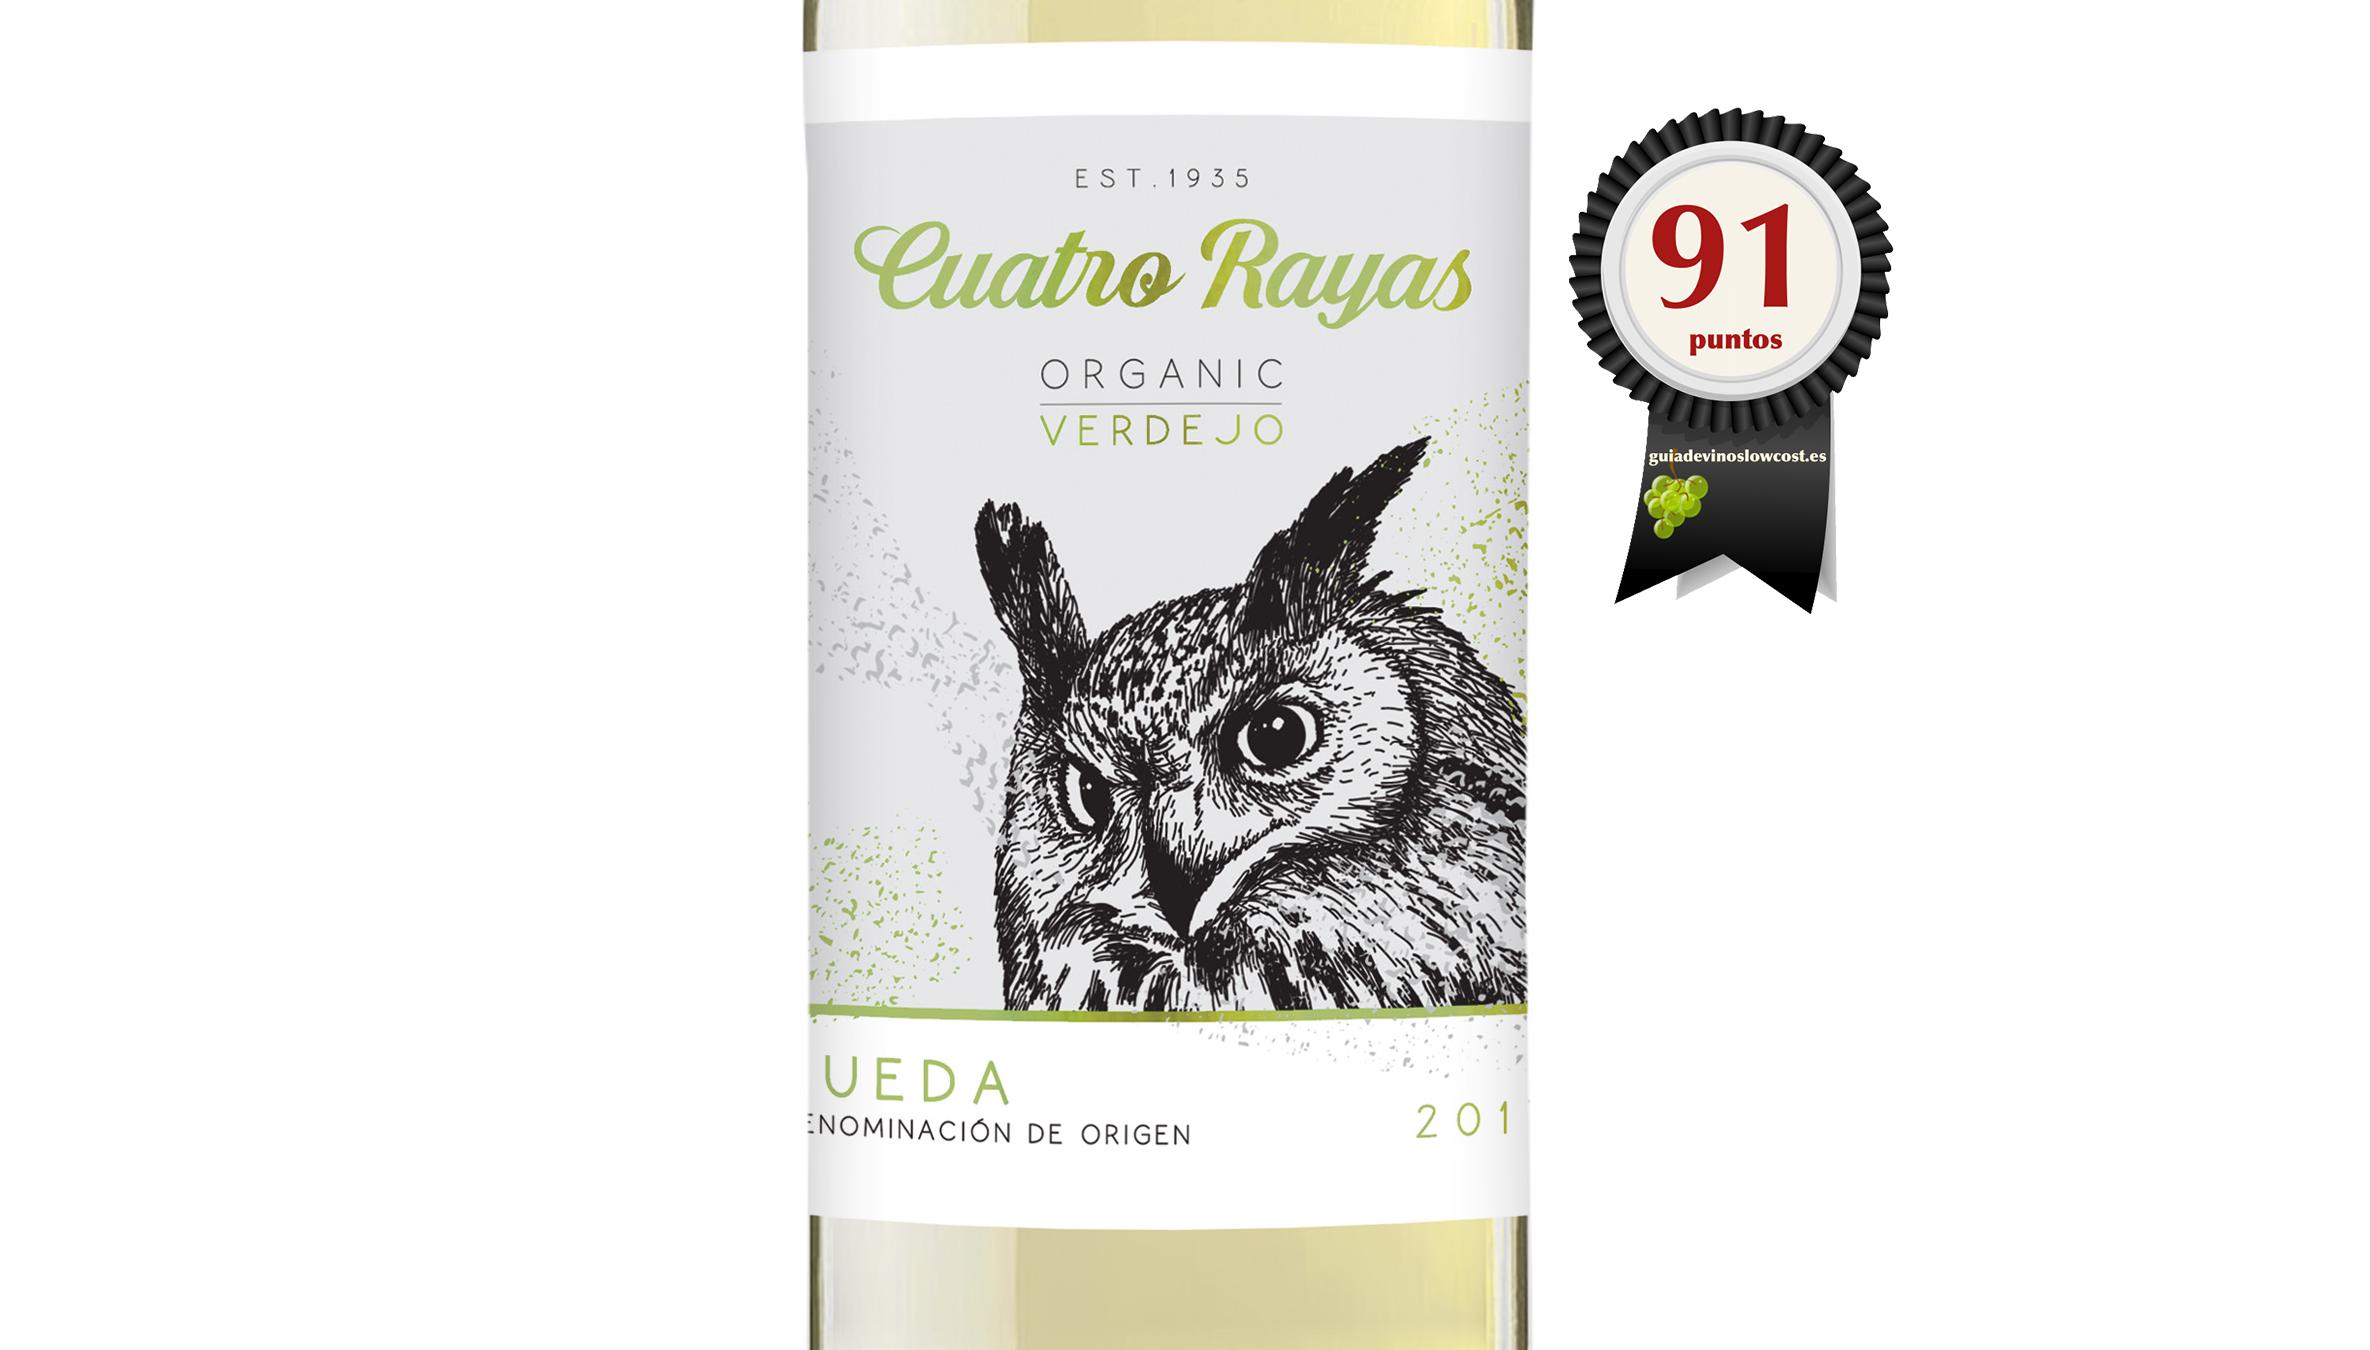 Cuatro Rayas Organic (Eco) 2017